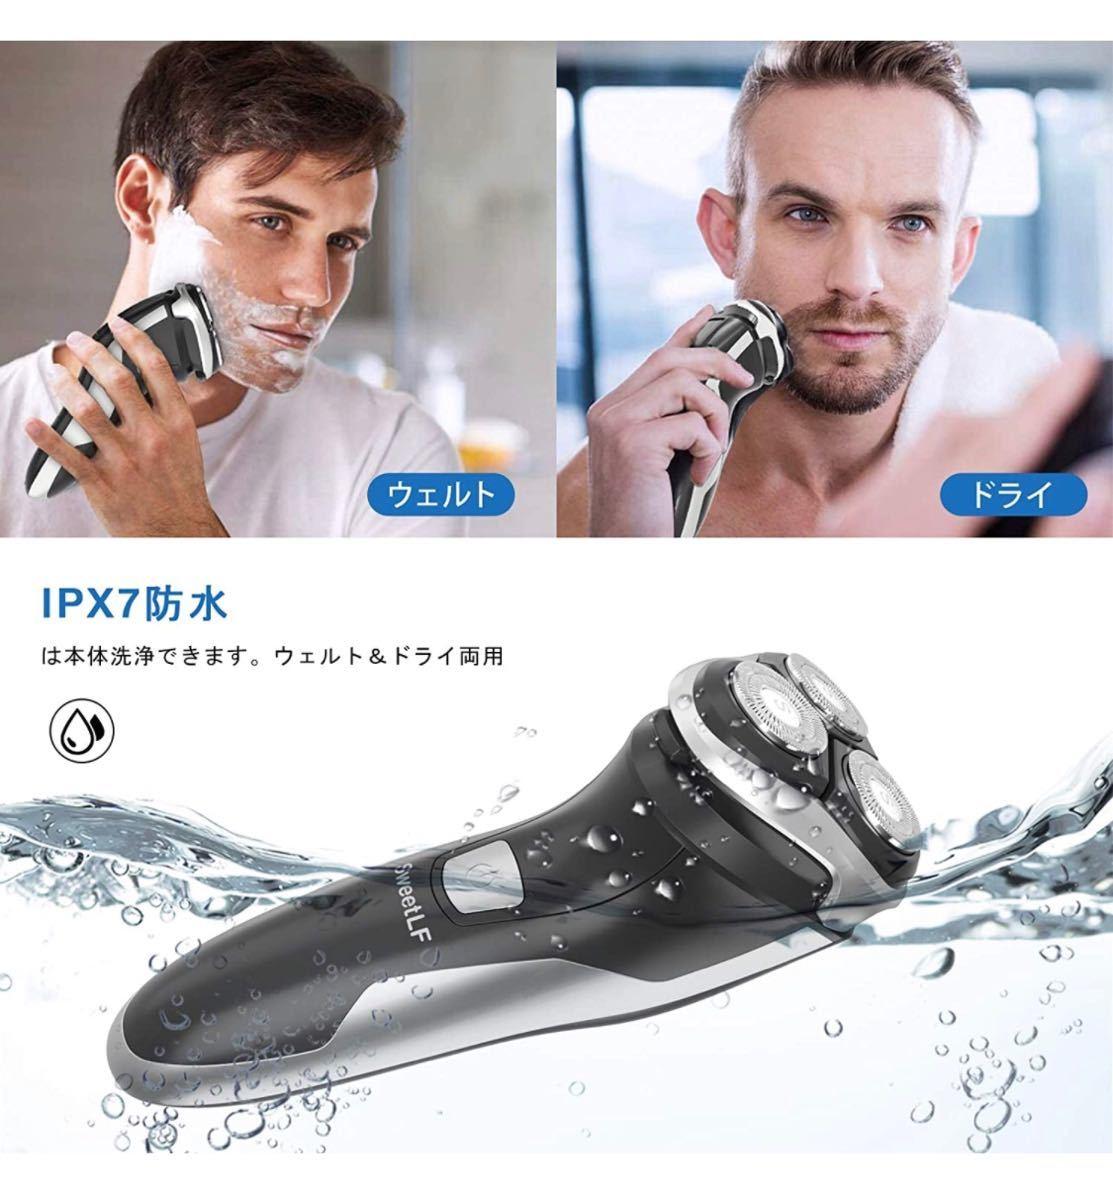 【新品】 電気シェーバー IPX7 USB充電式